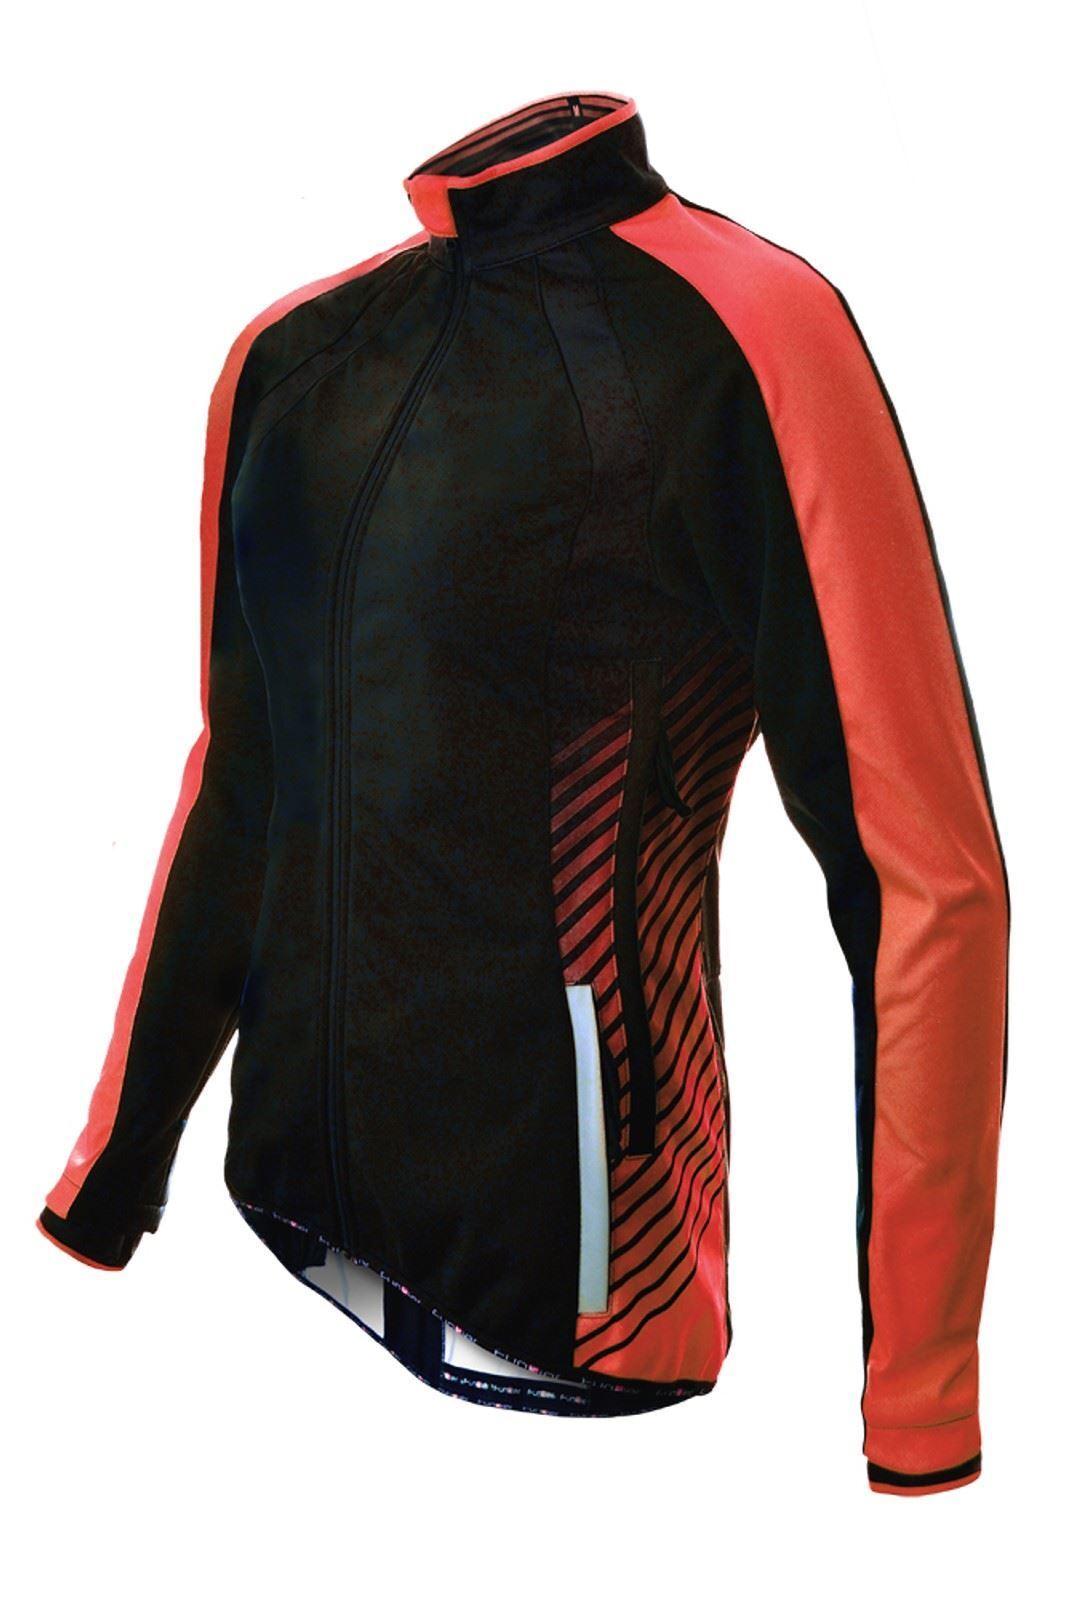 Chaqueta Ciclismo Funkier  Tacona WJ-1324 Mujer Windstopper Negro Rojo Xs  descuento de ventas